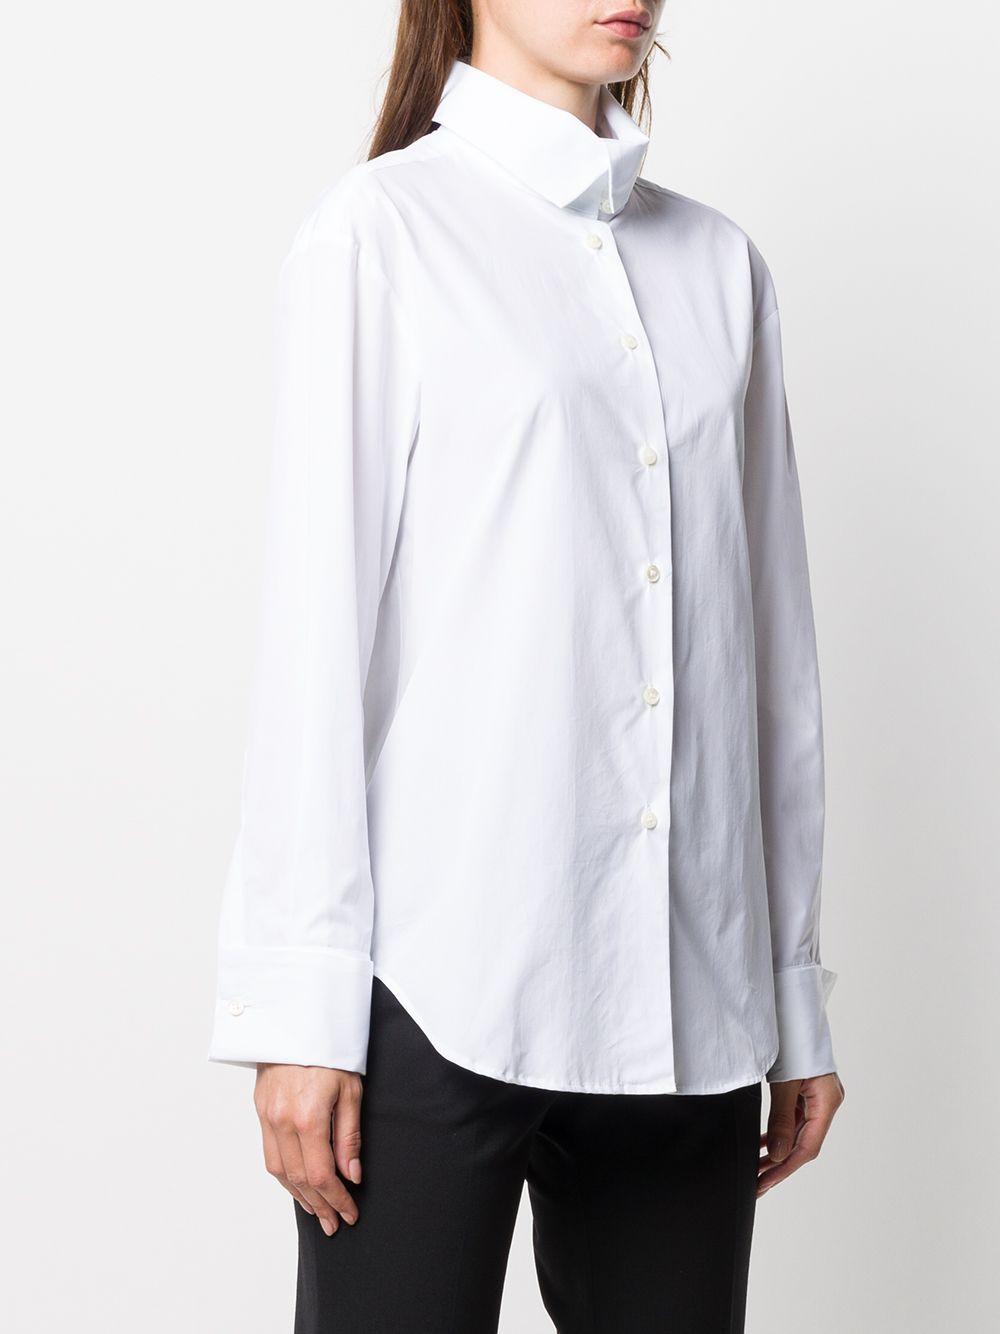 White cotton classic button-up shirt ALBERTO BIANI |  | MM839-CO013510